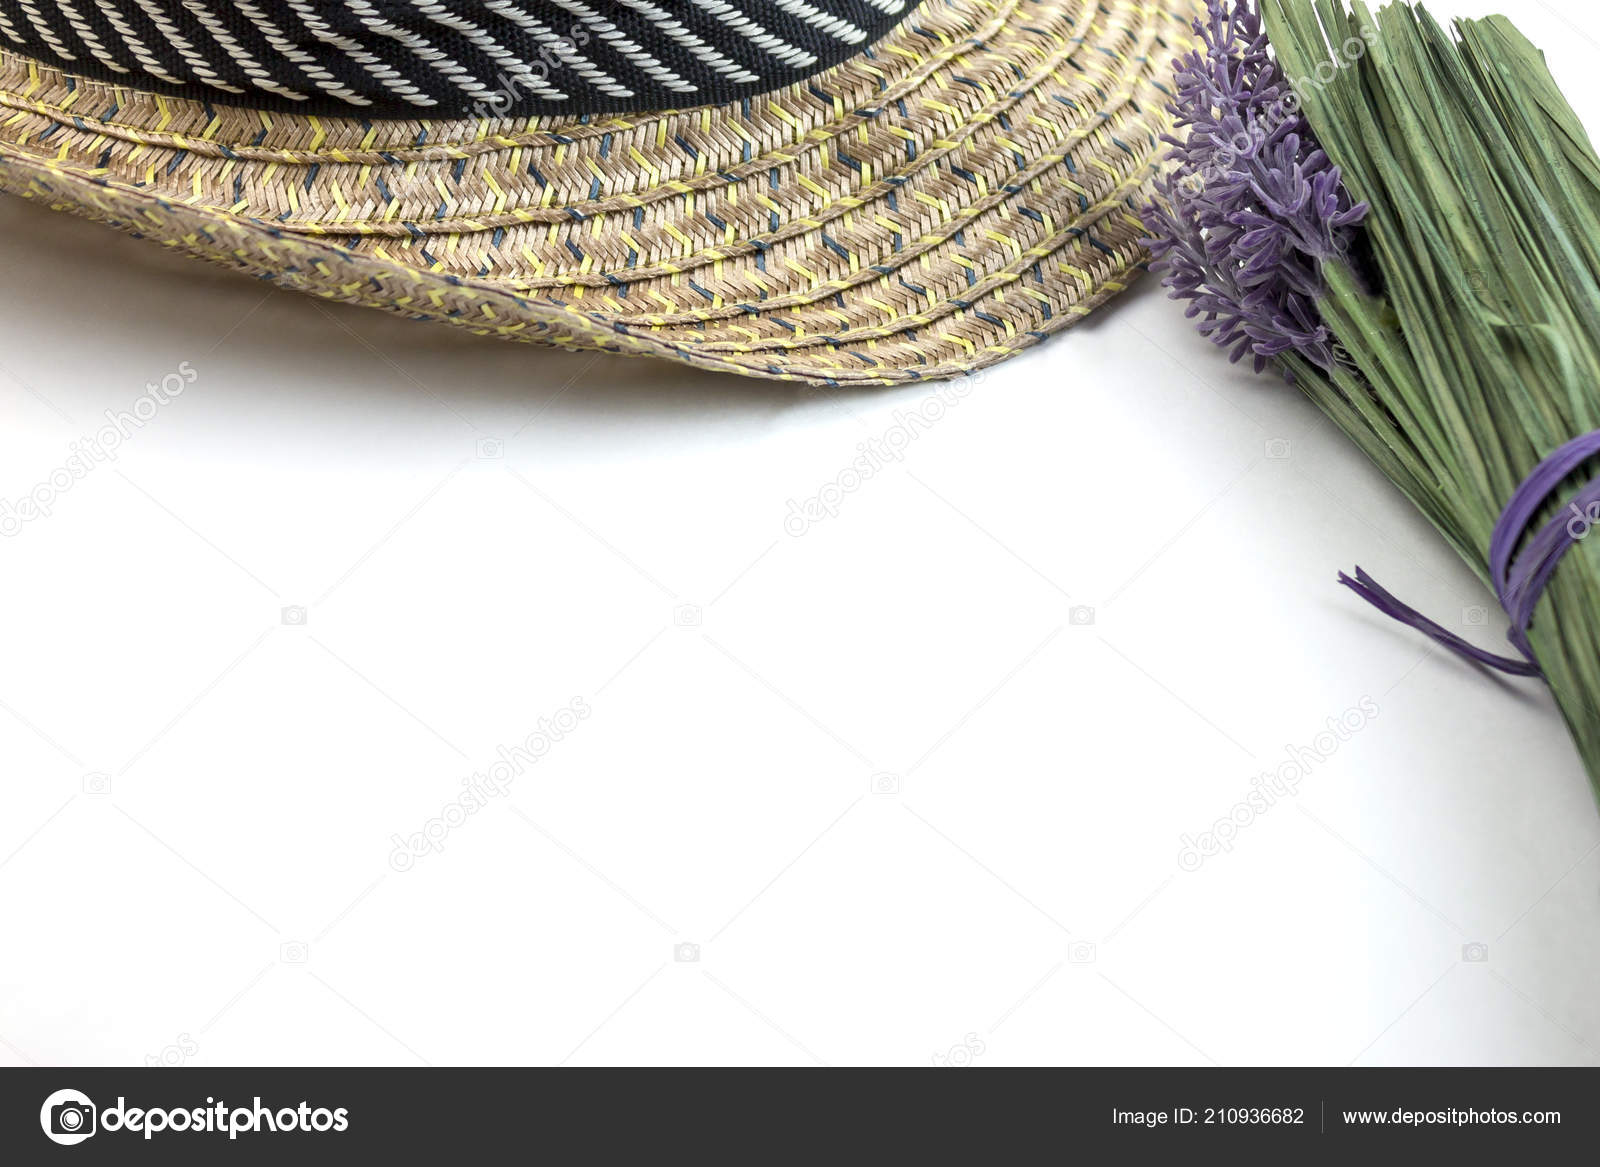 Lavender Dried Flower Arrangements - Flowers Healthy